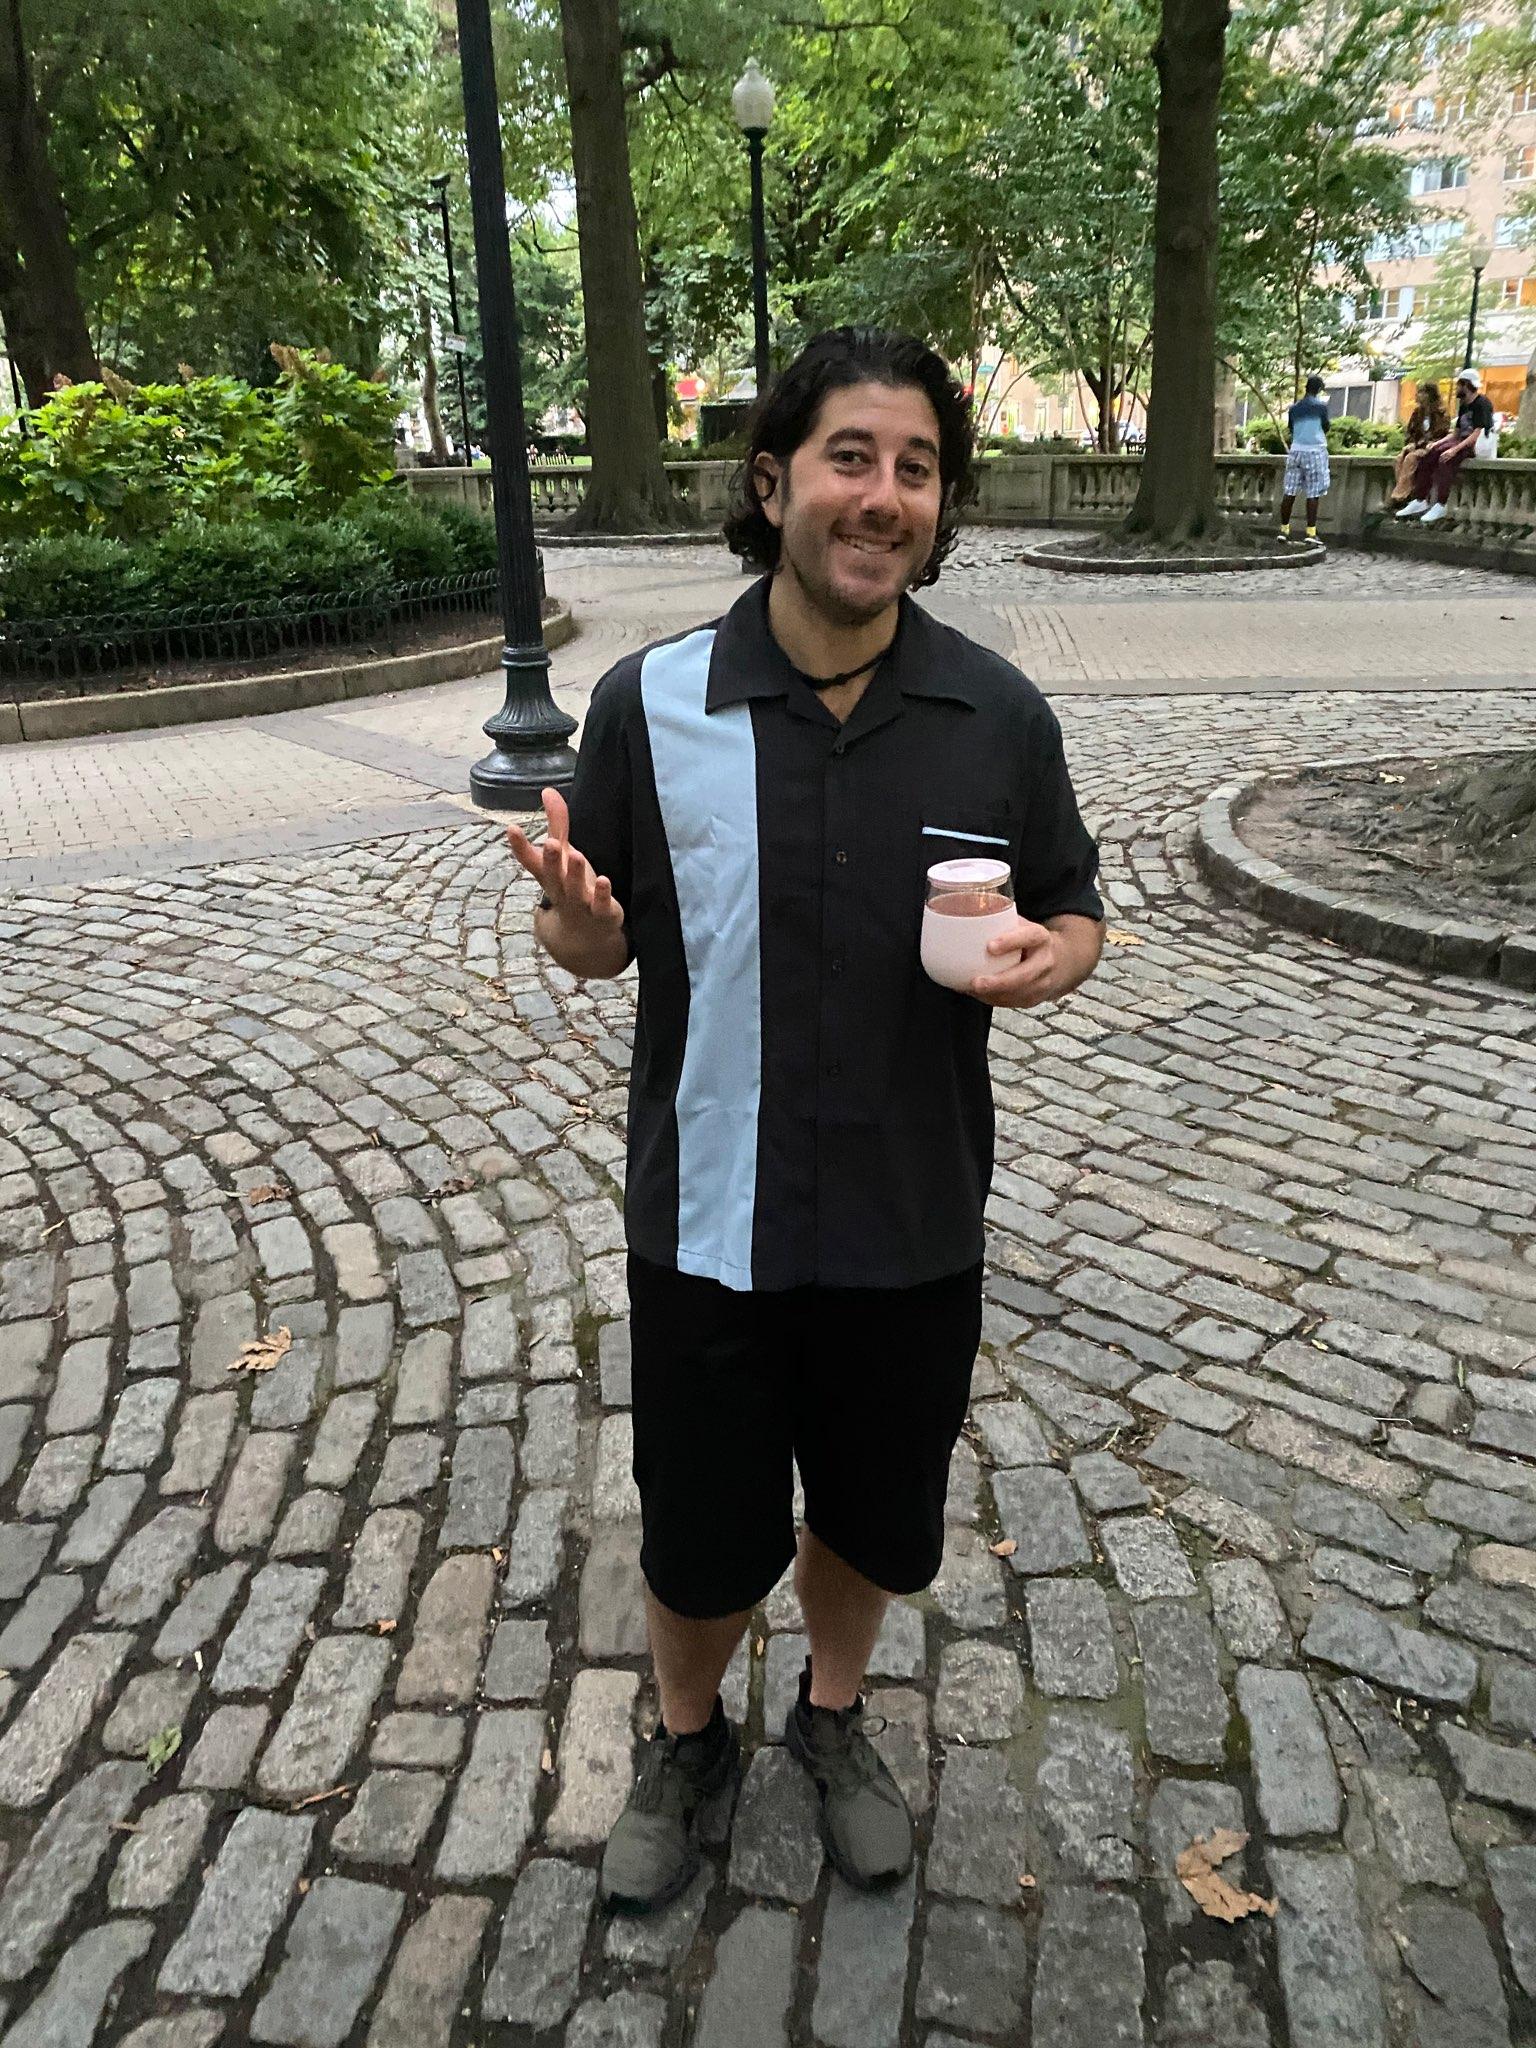 Lee shrugs in Rittenhouse Square